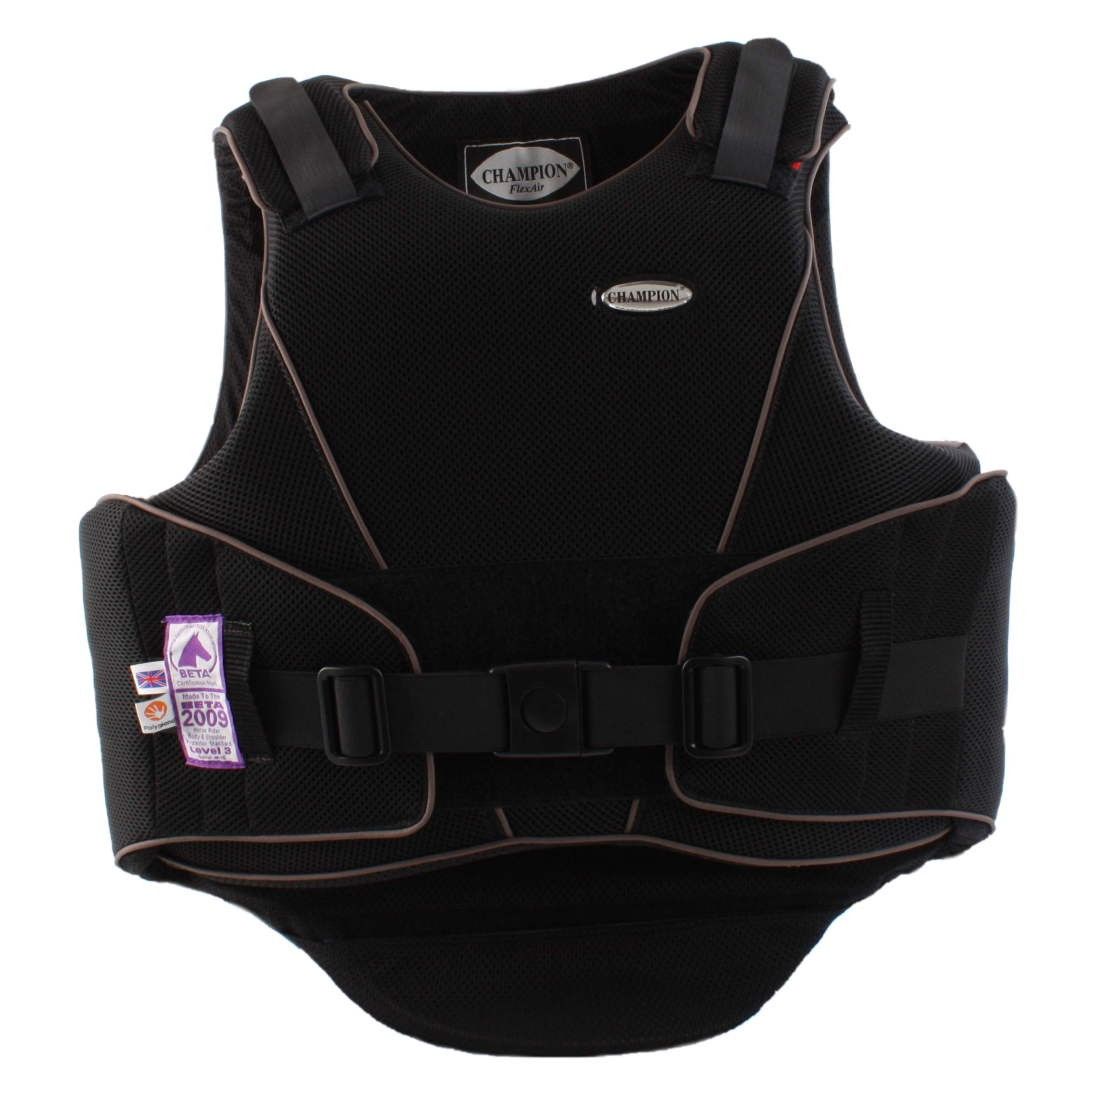 Champion Flexair Body Protector Adults